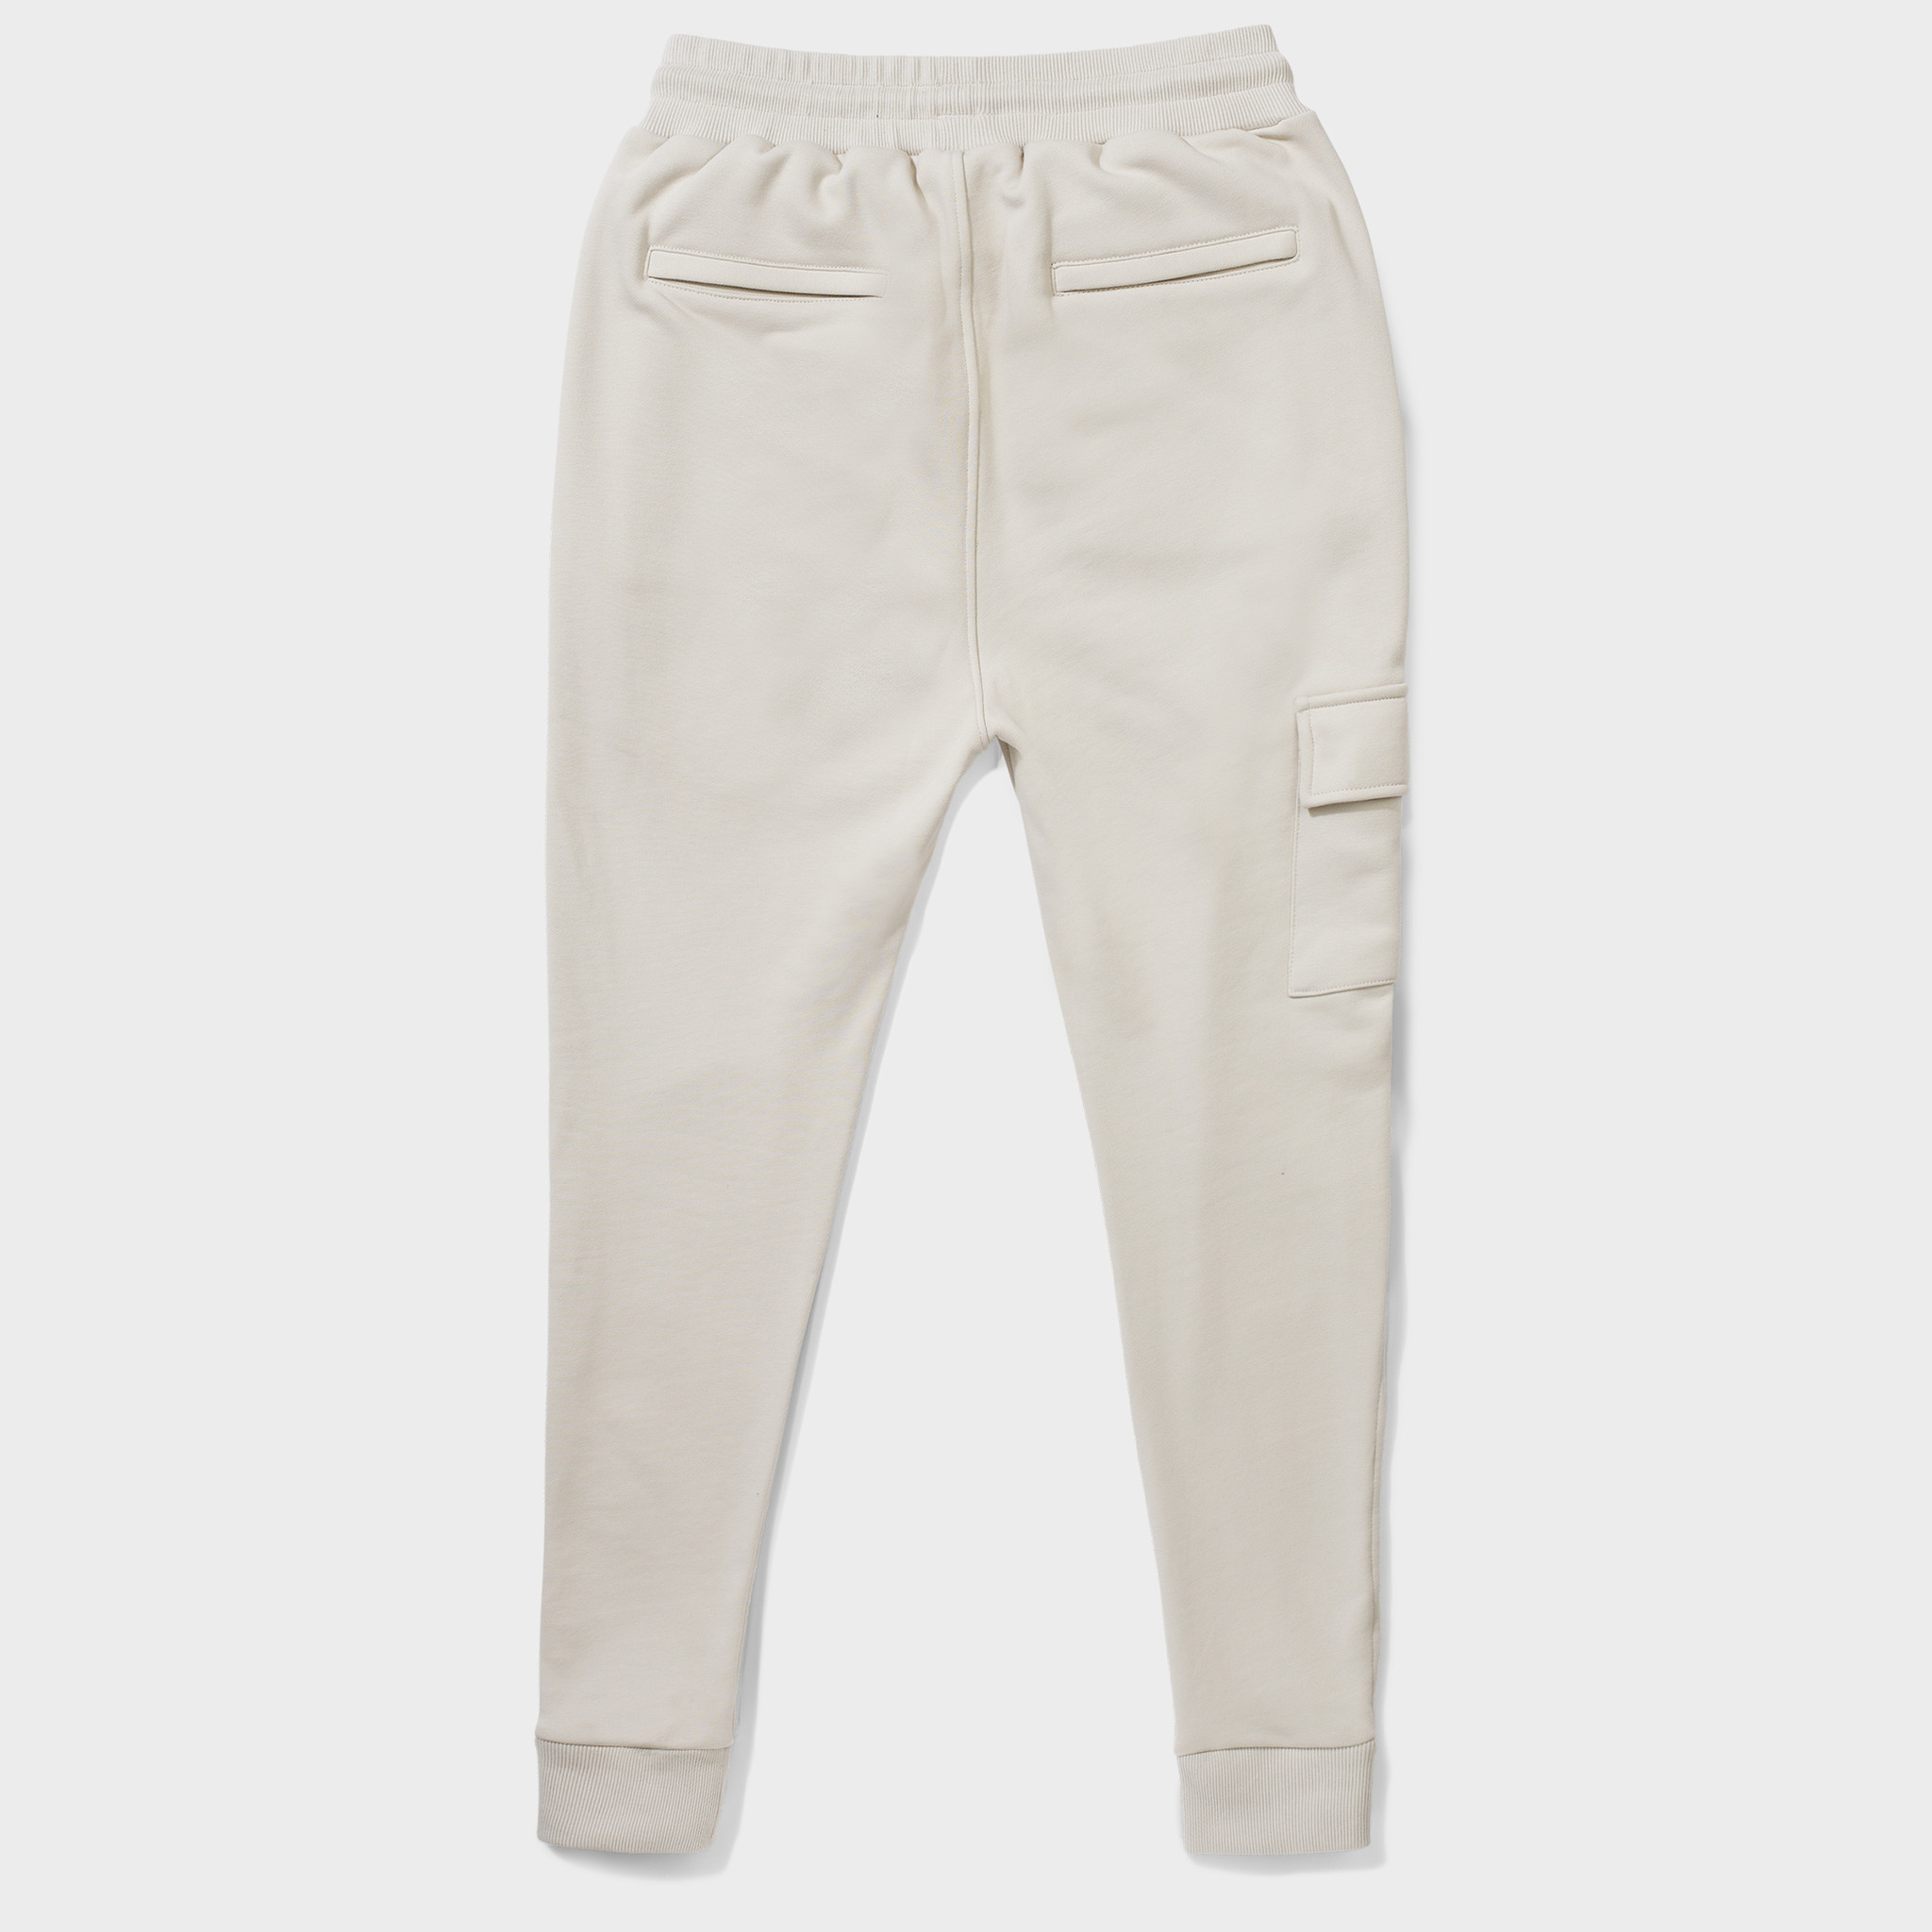 Wafi Signature Pants Beige-2